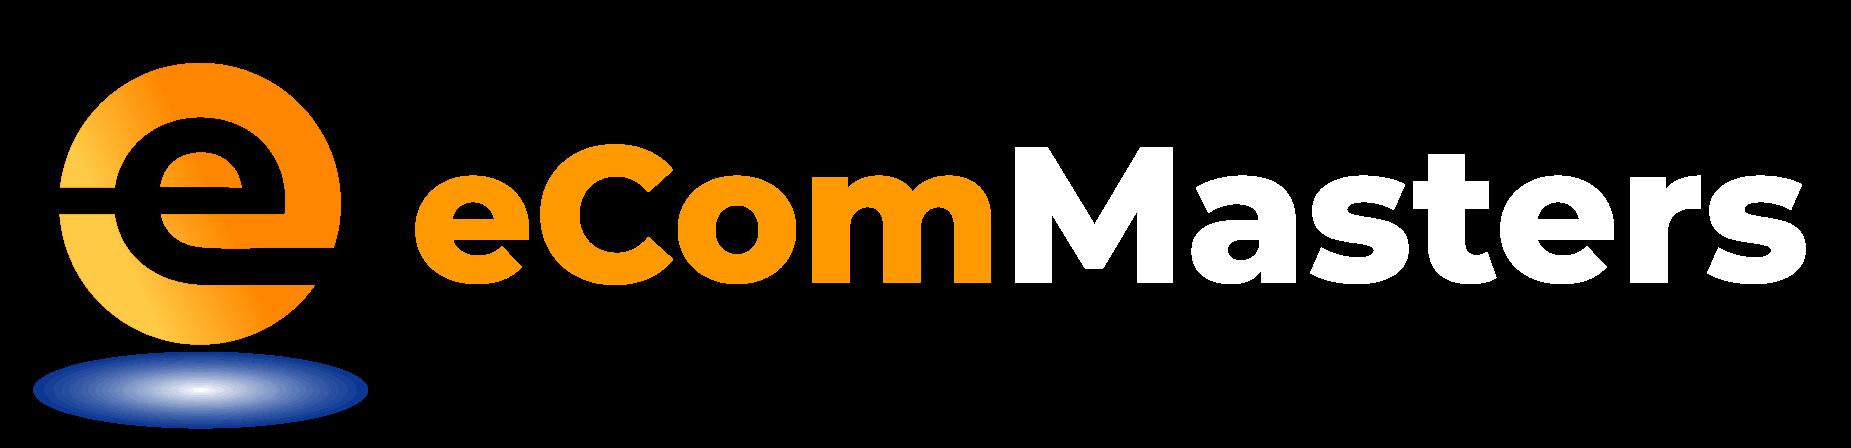 eComMasters Logo 06